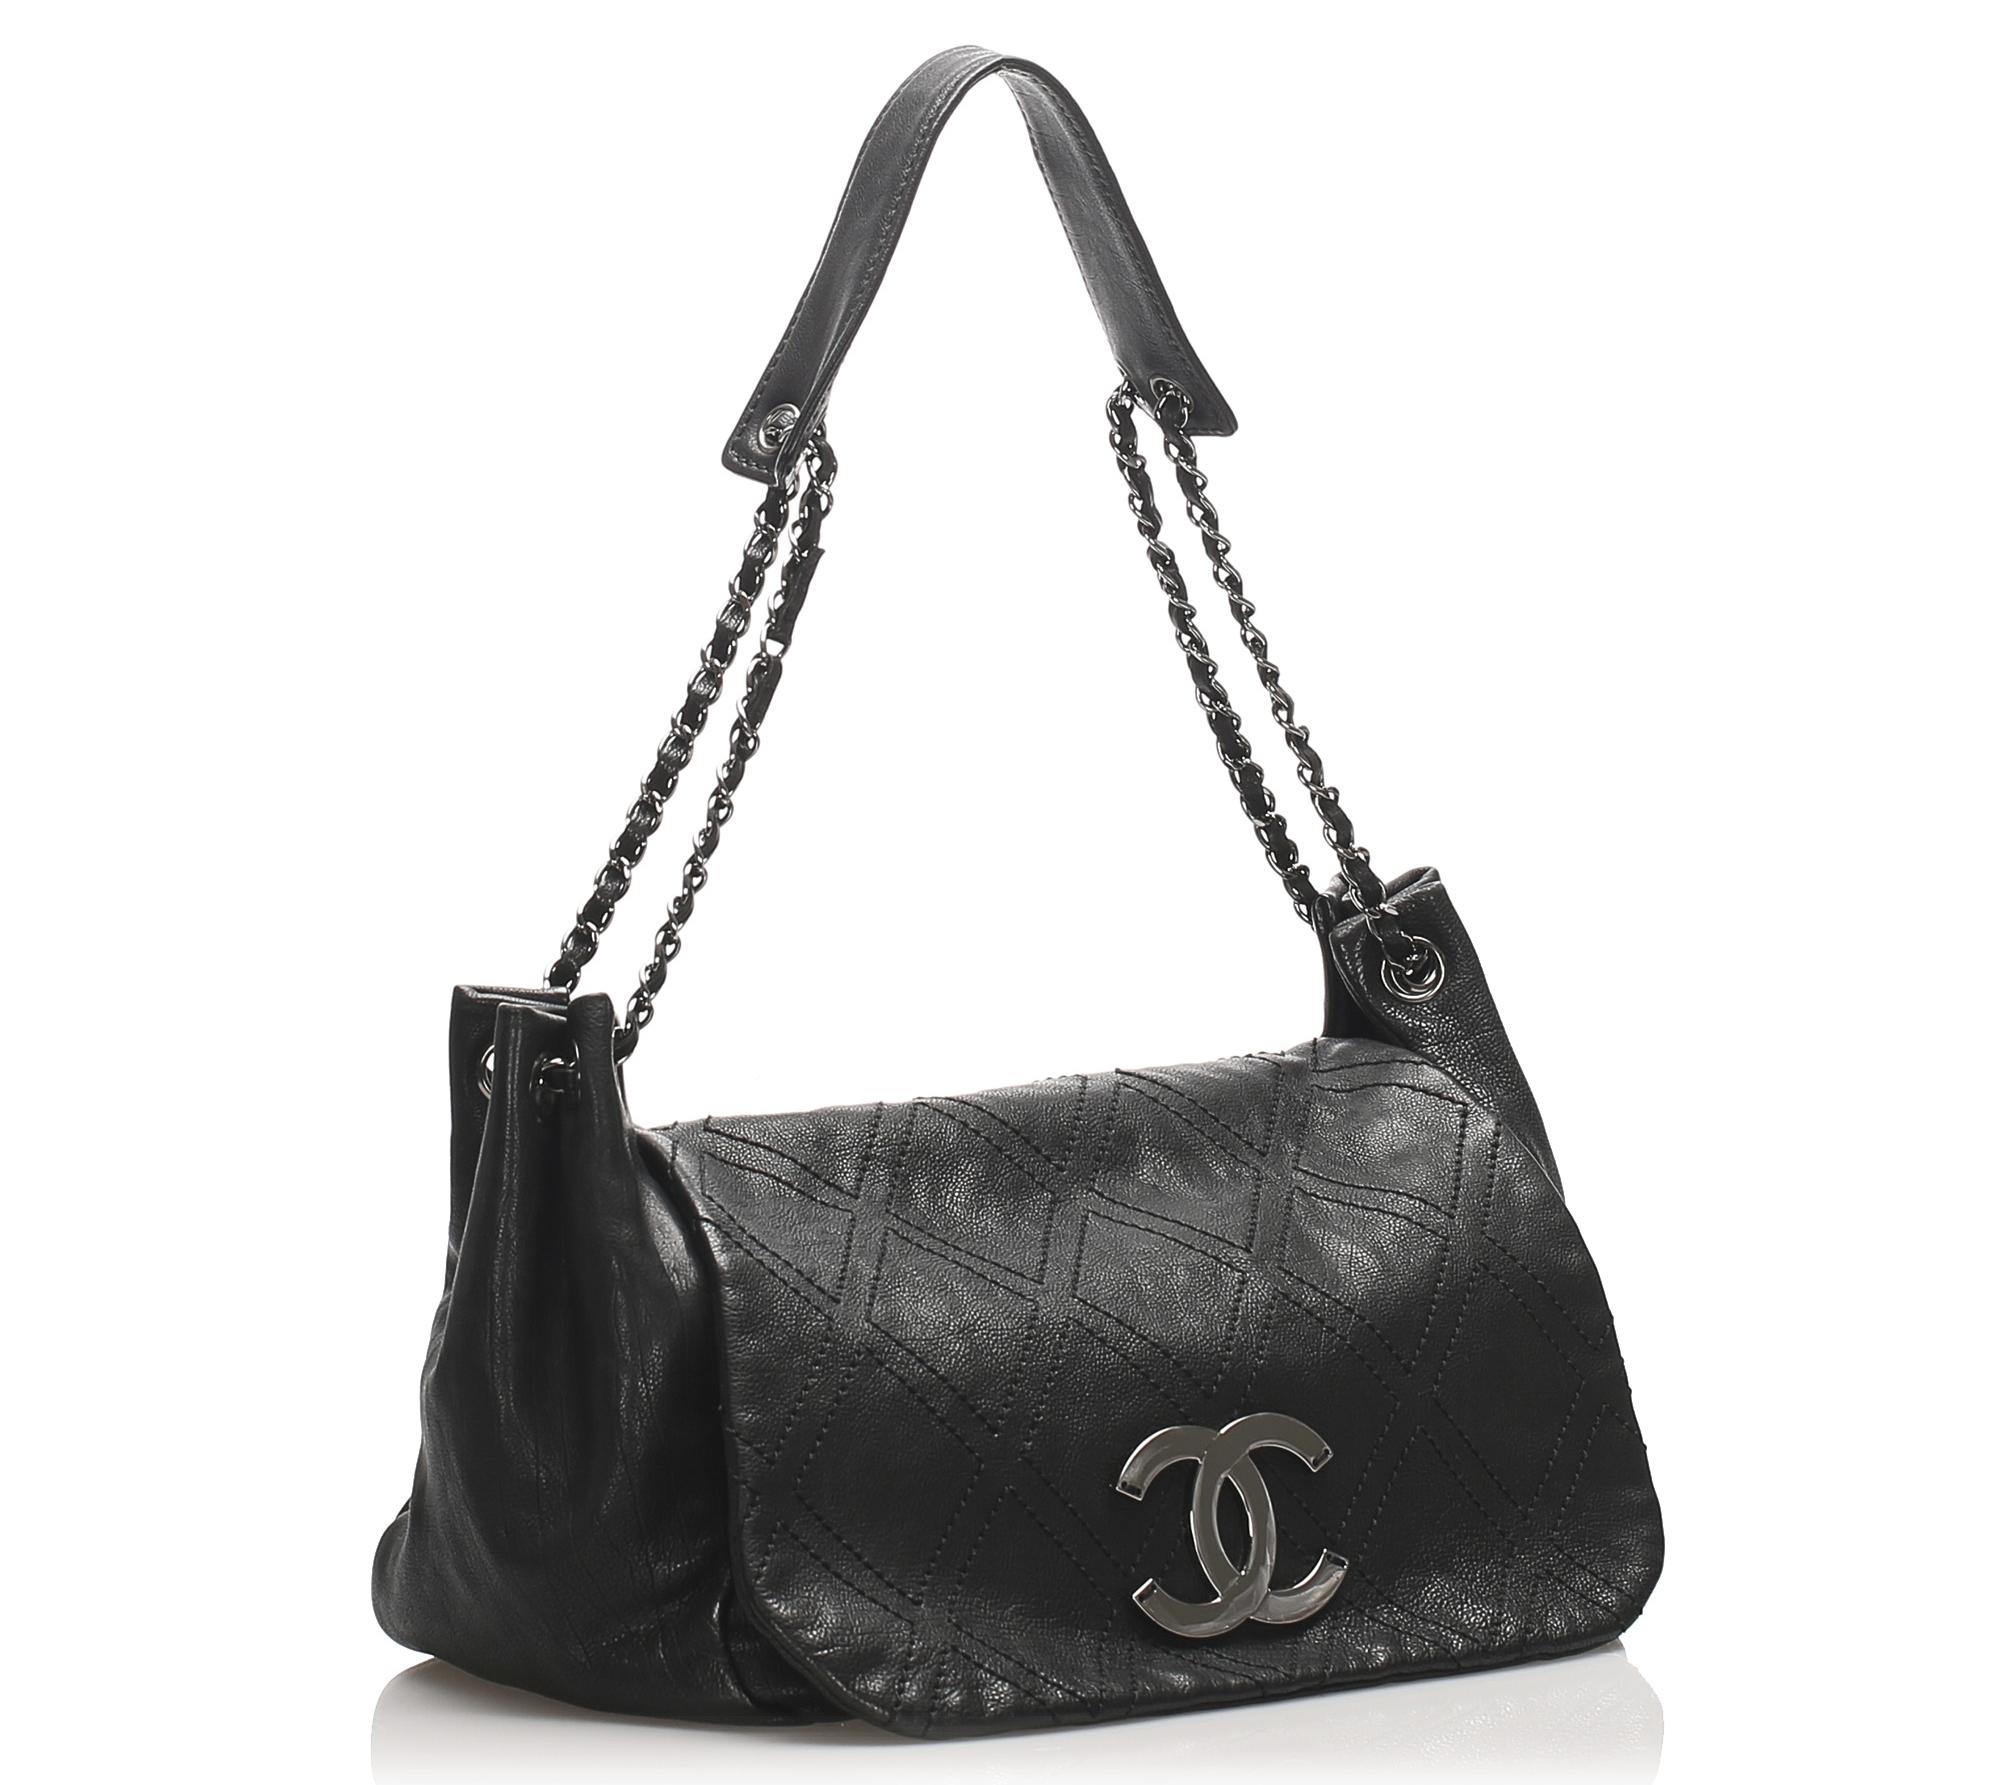 Chanel Accordion Flap Tas Leer